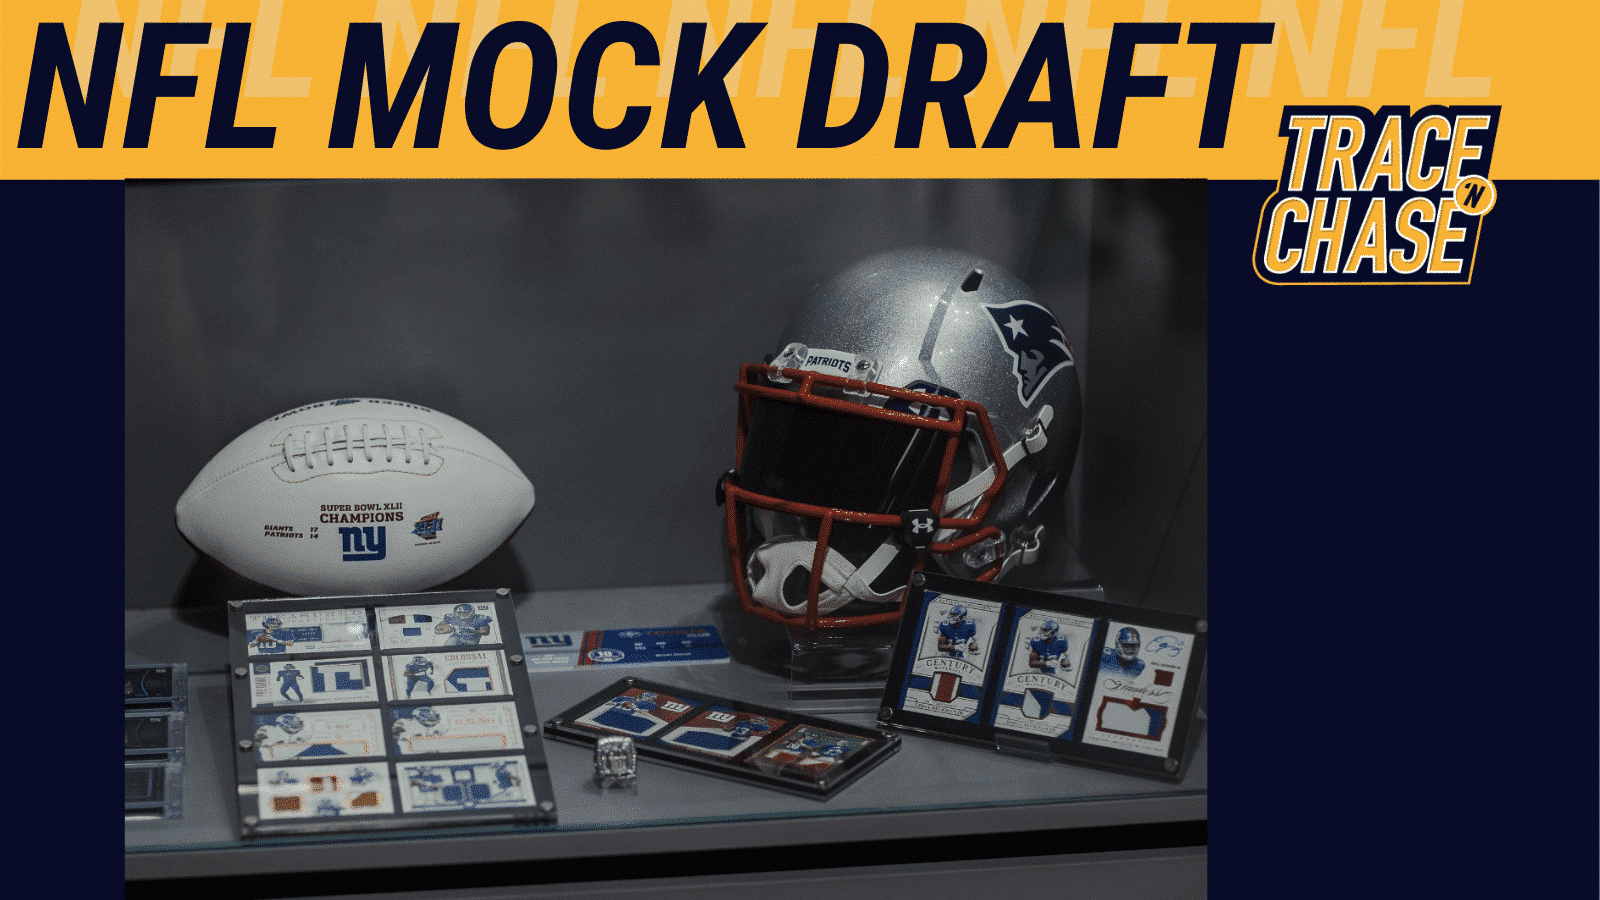 Drew's NFL Mock Draft Part I